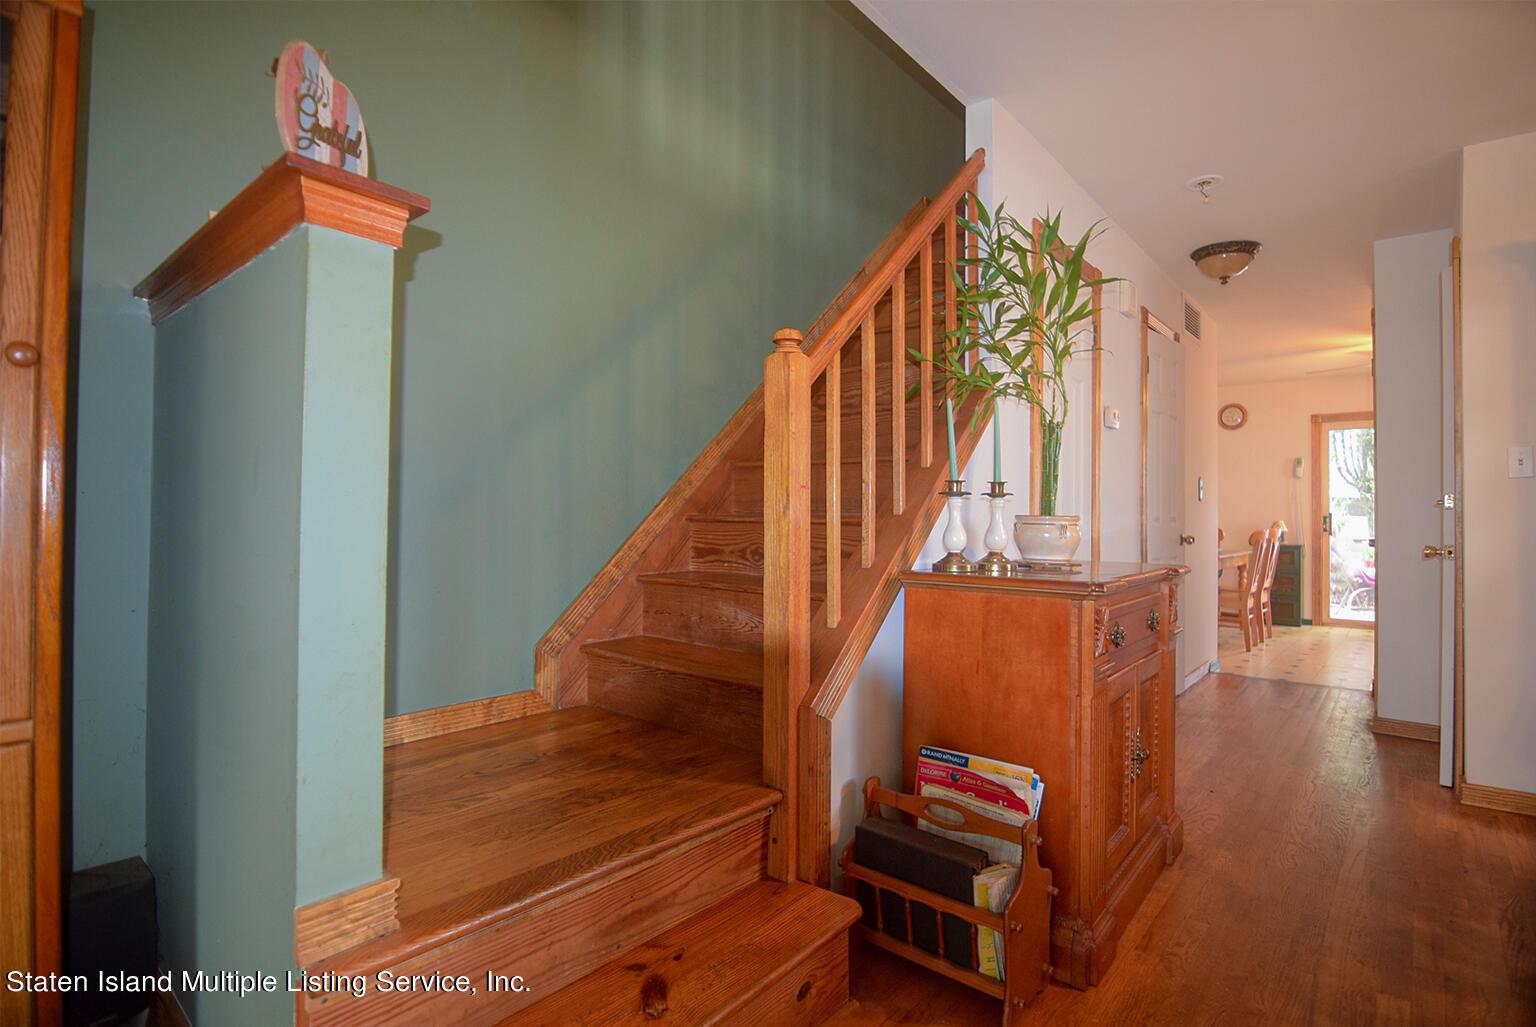 Single Family - Semi-Attached 524 Tennyson Drive  Staten Island, NY 10312, MLS-1149452-10